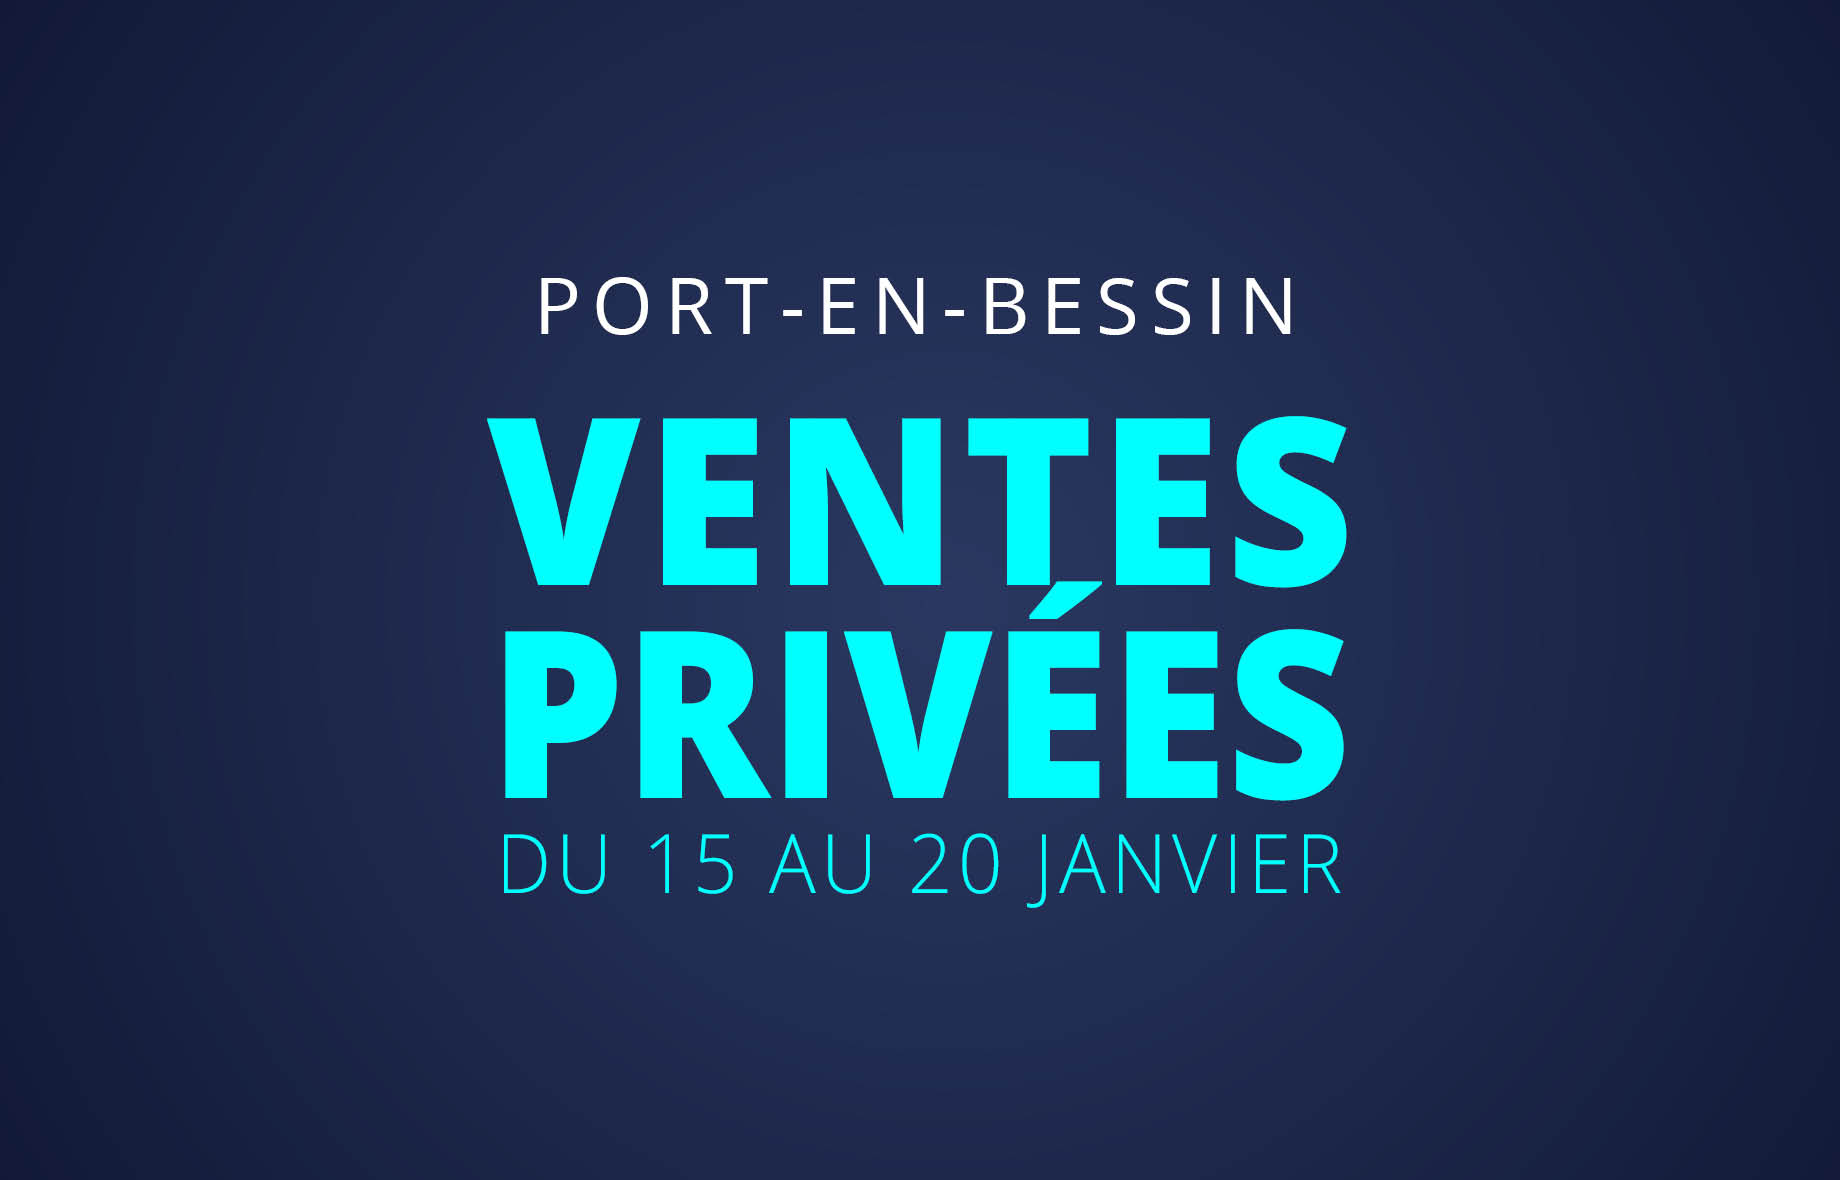 Port-en-Bessin Ventes Privées